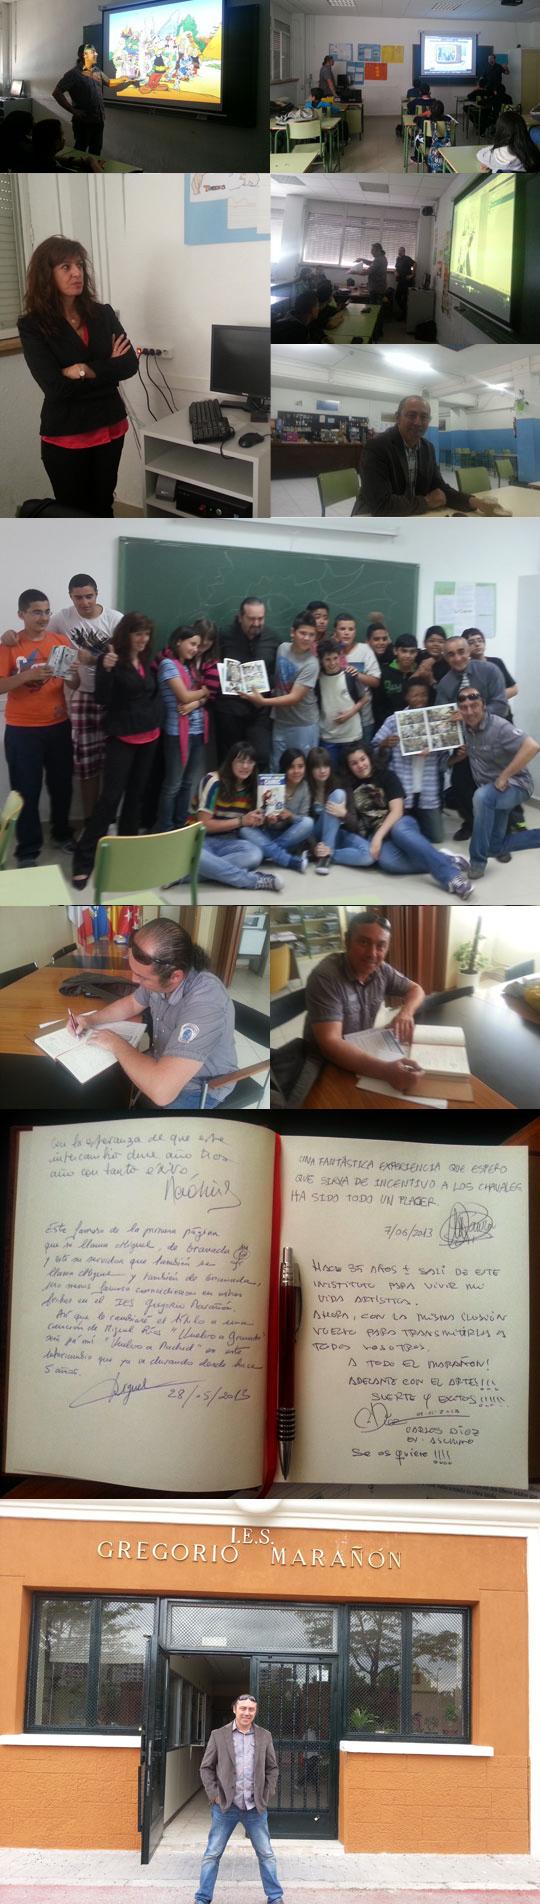 Carlos-Diez-masterclass-clase-magistral-comic-instituto-Gregorio-Maranon-madrid-academia-c10